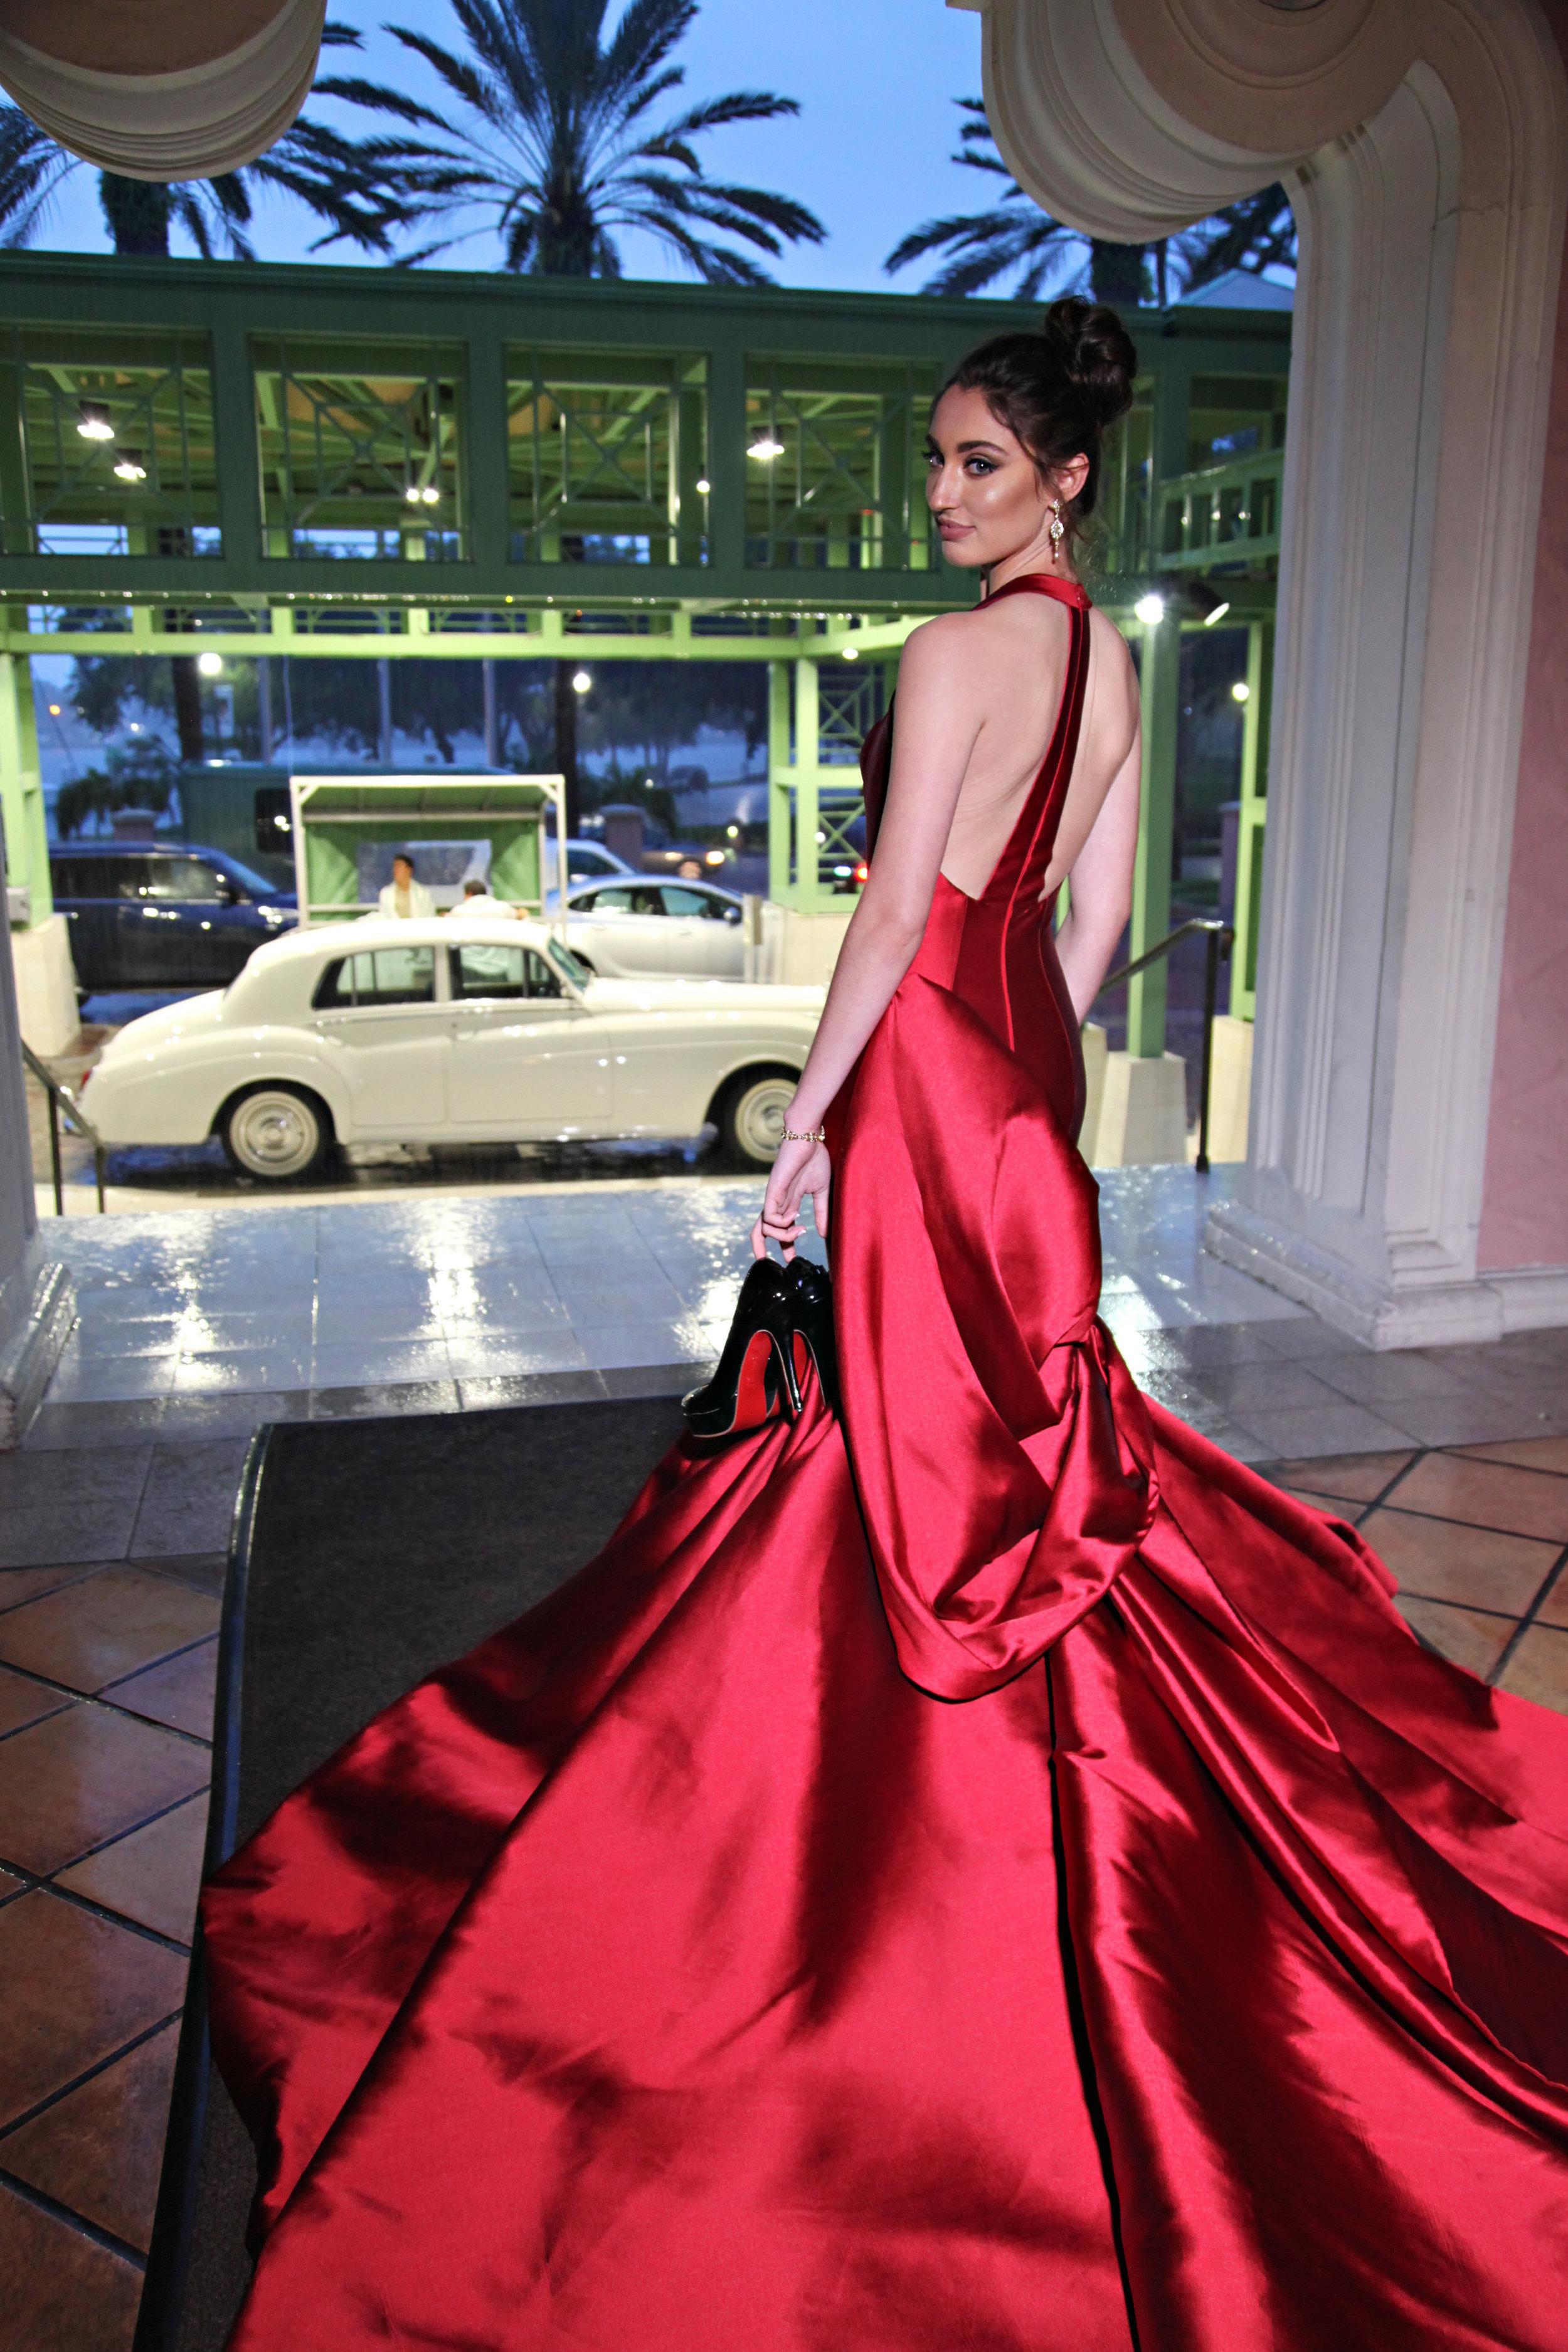 Red Evening Gown Vinoy Wedding.jpg